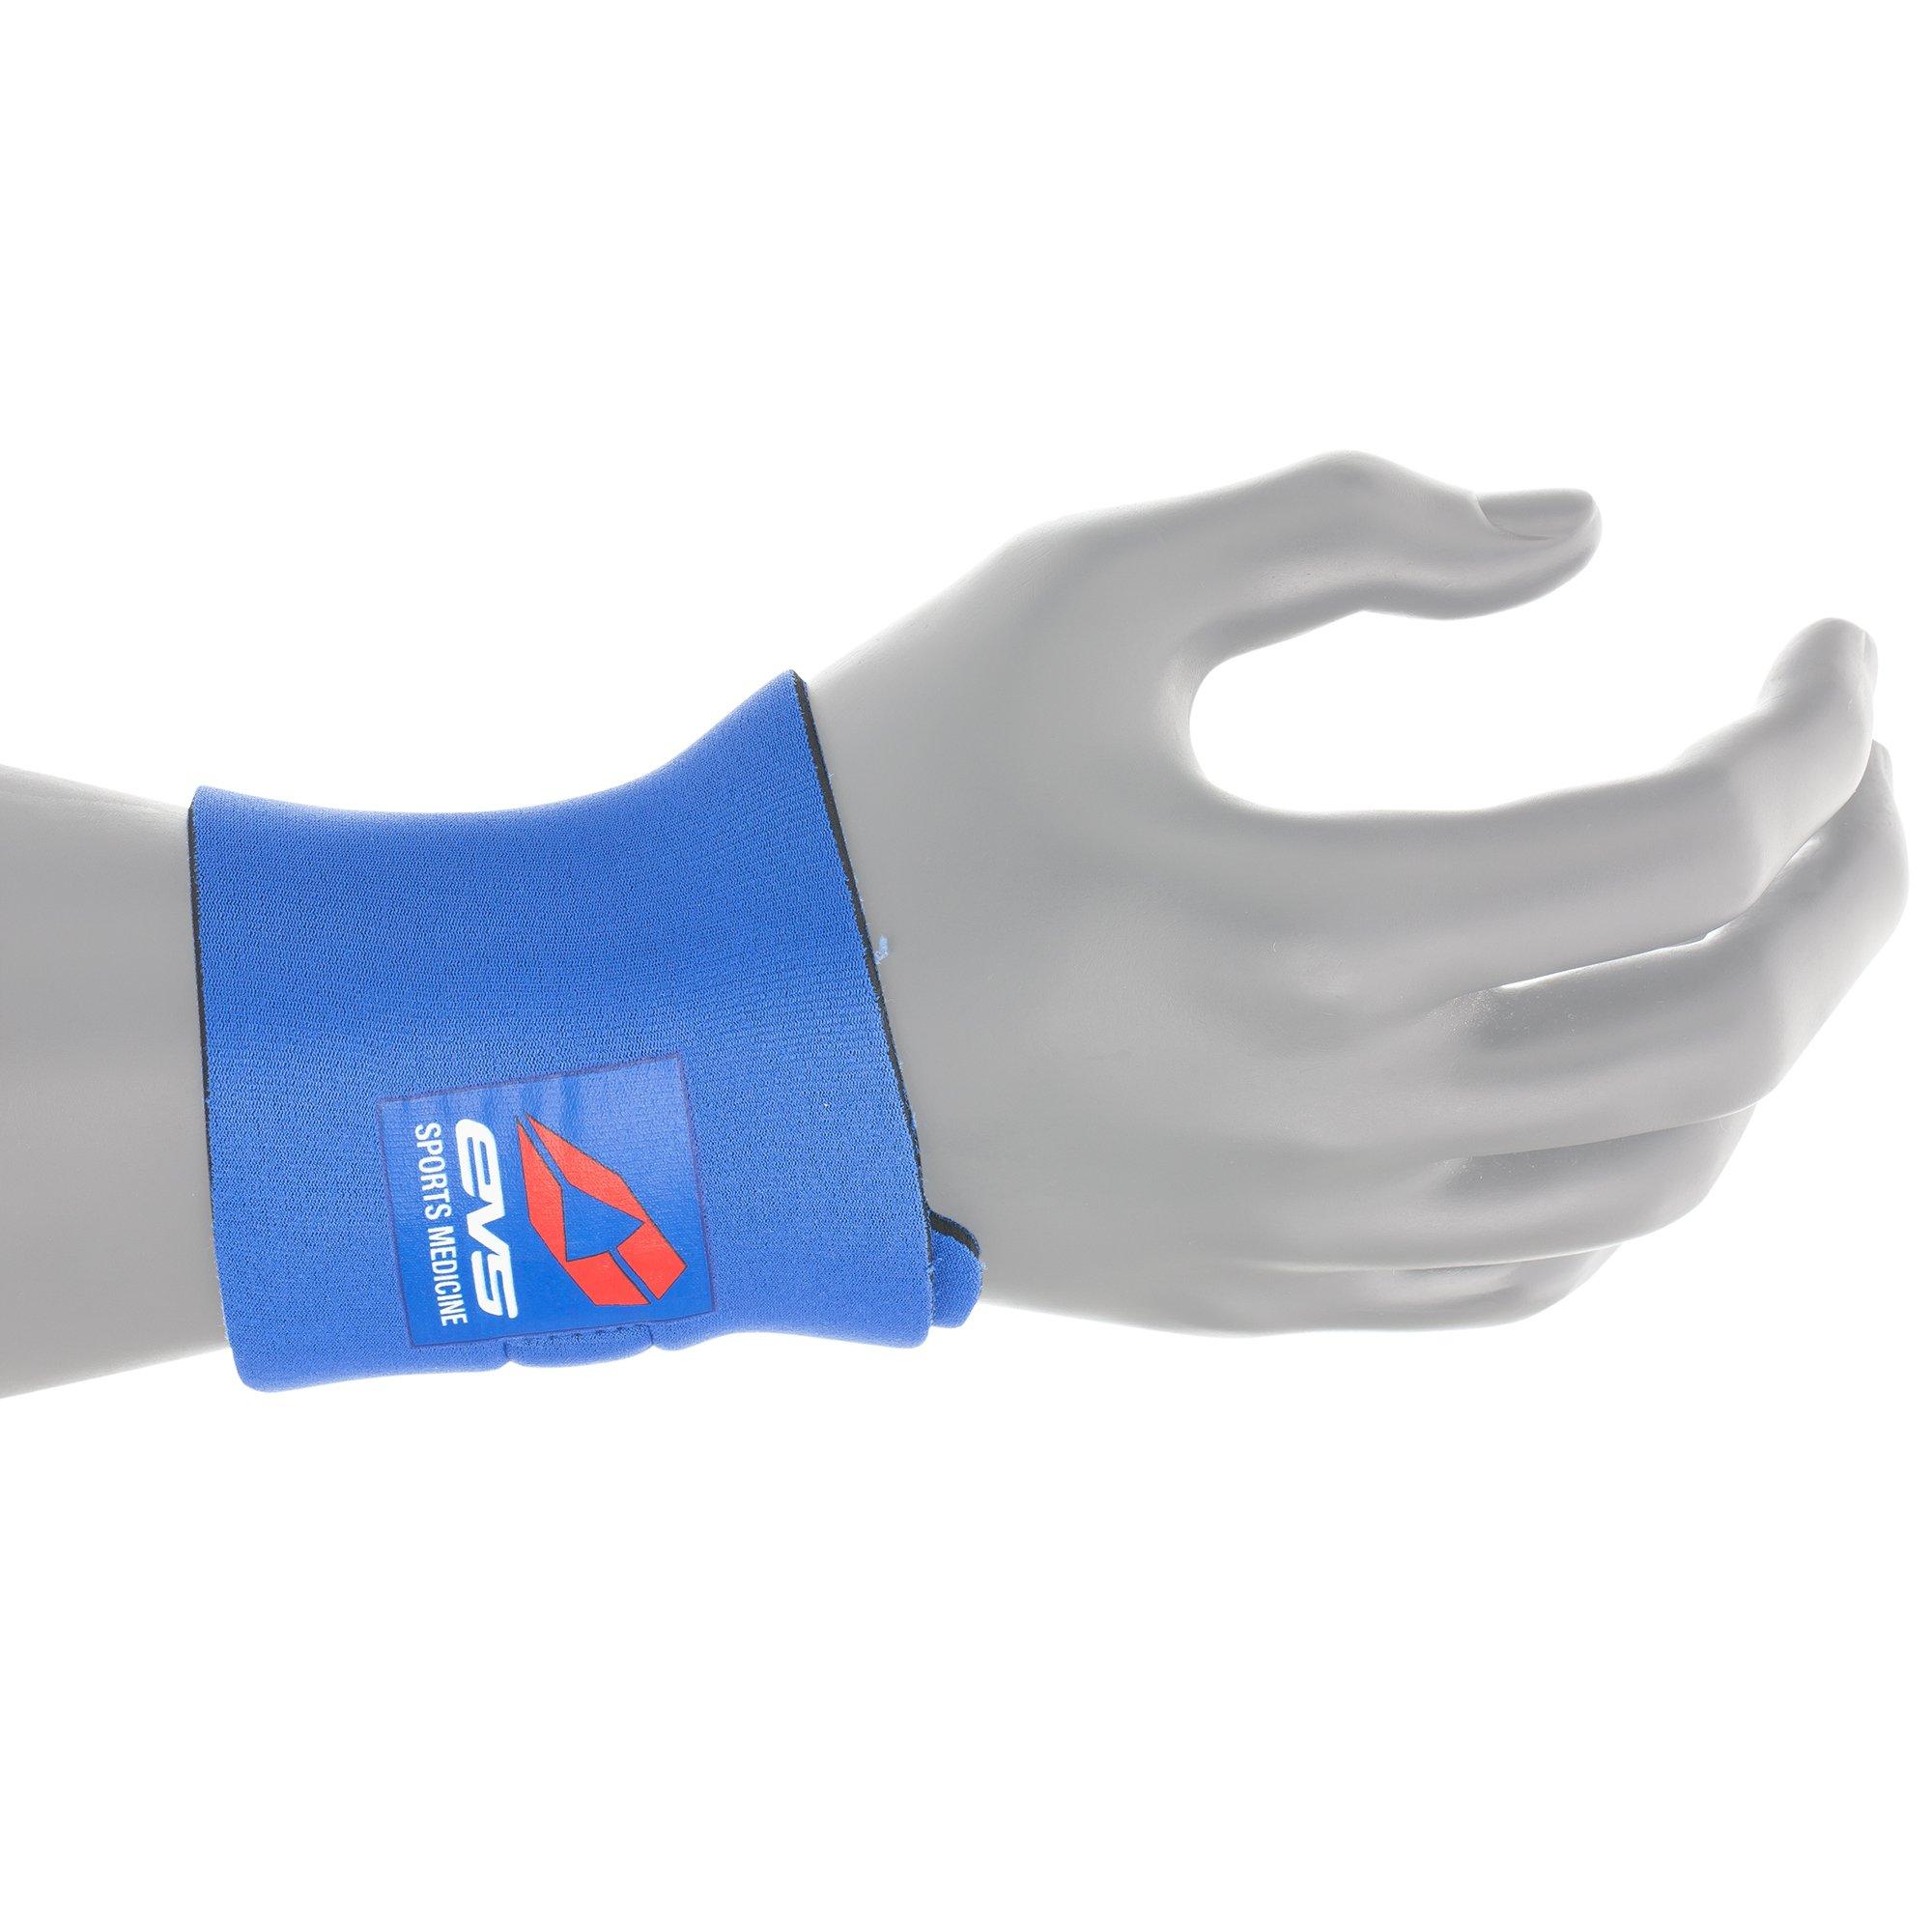 EVS Sports Unisex-Adult Neoprene Wrist Support (Blue, One Size)